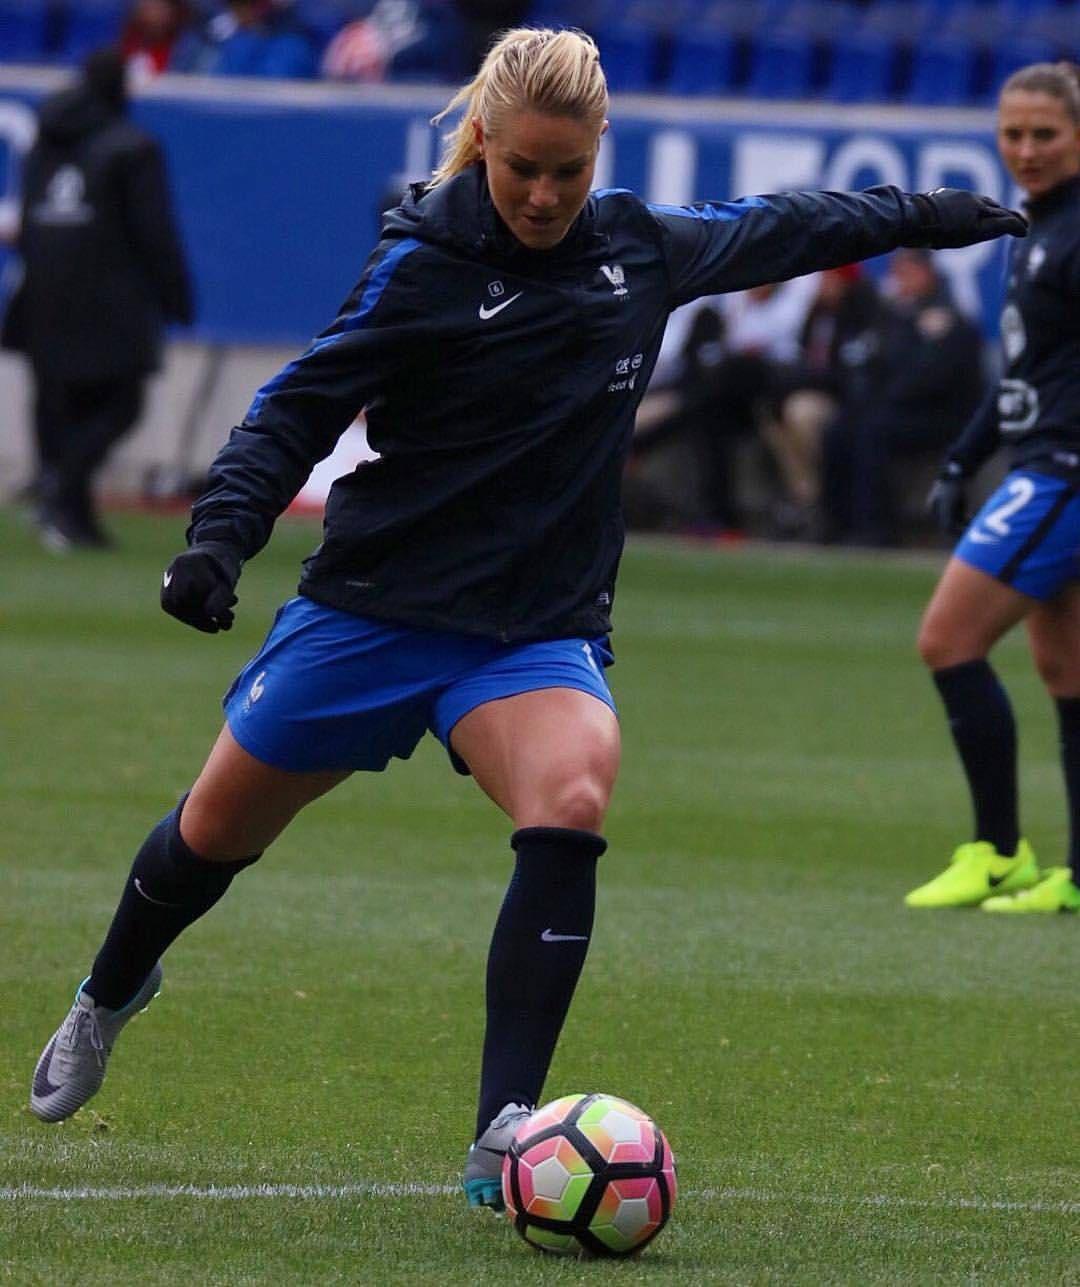 Amandine Henry Equipe De France Football Girls Female Football Player Womens Football